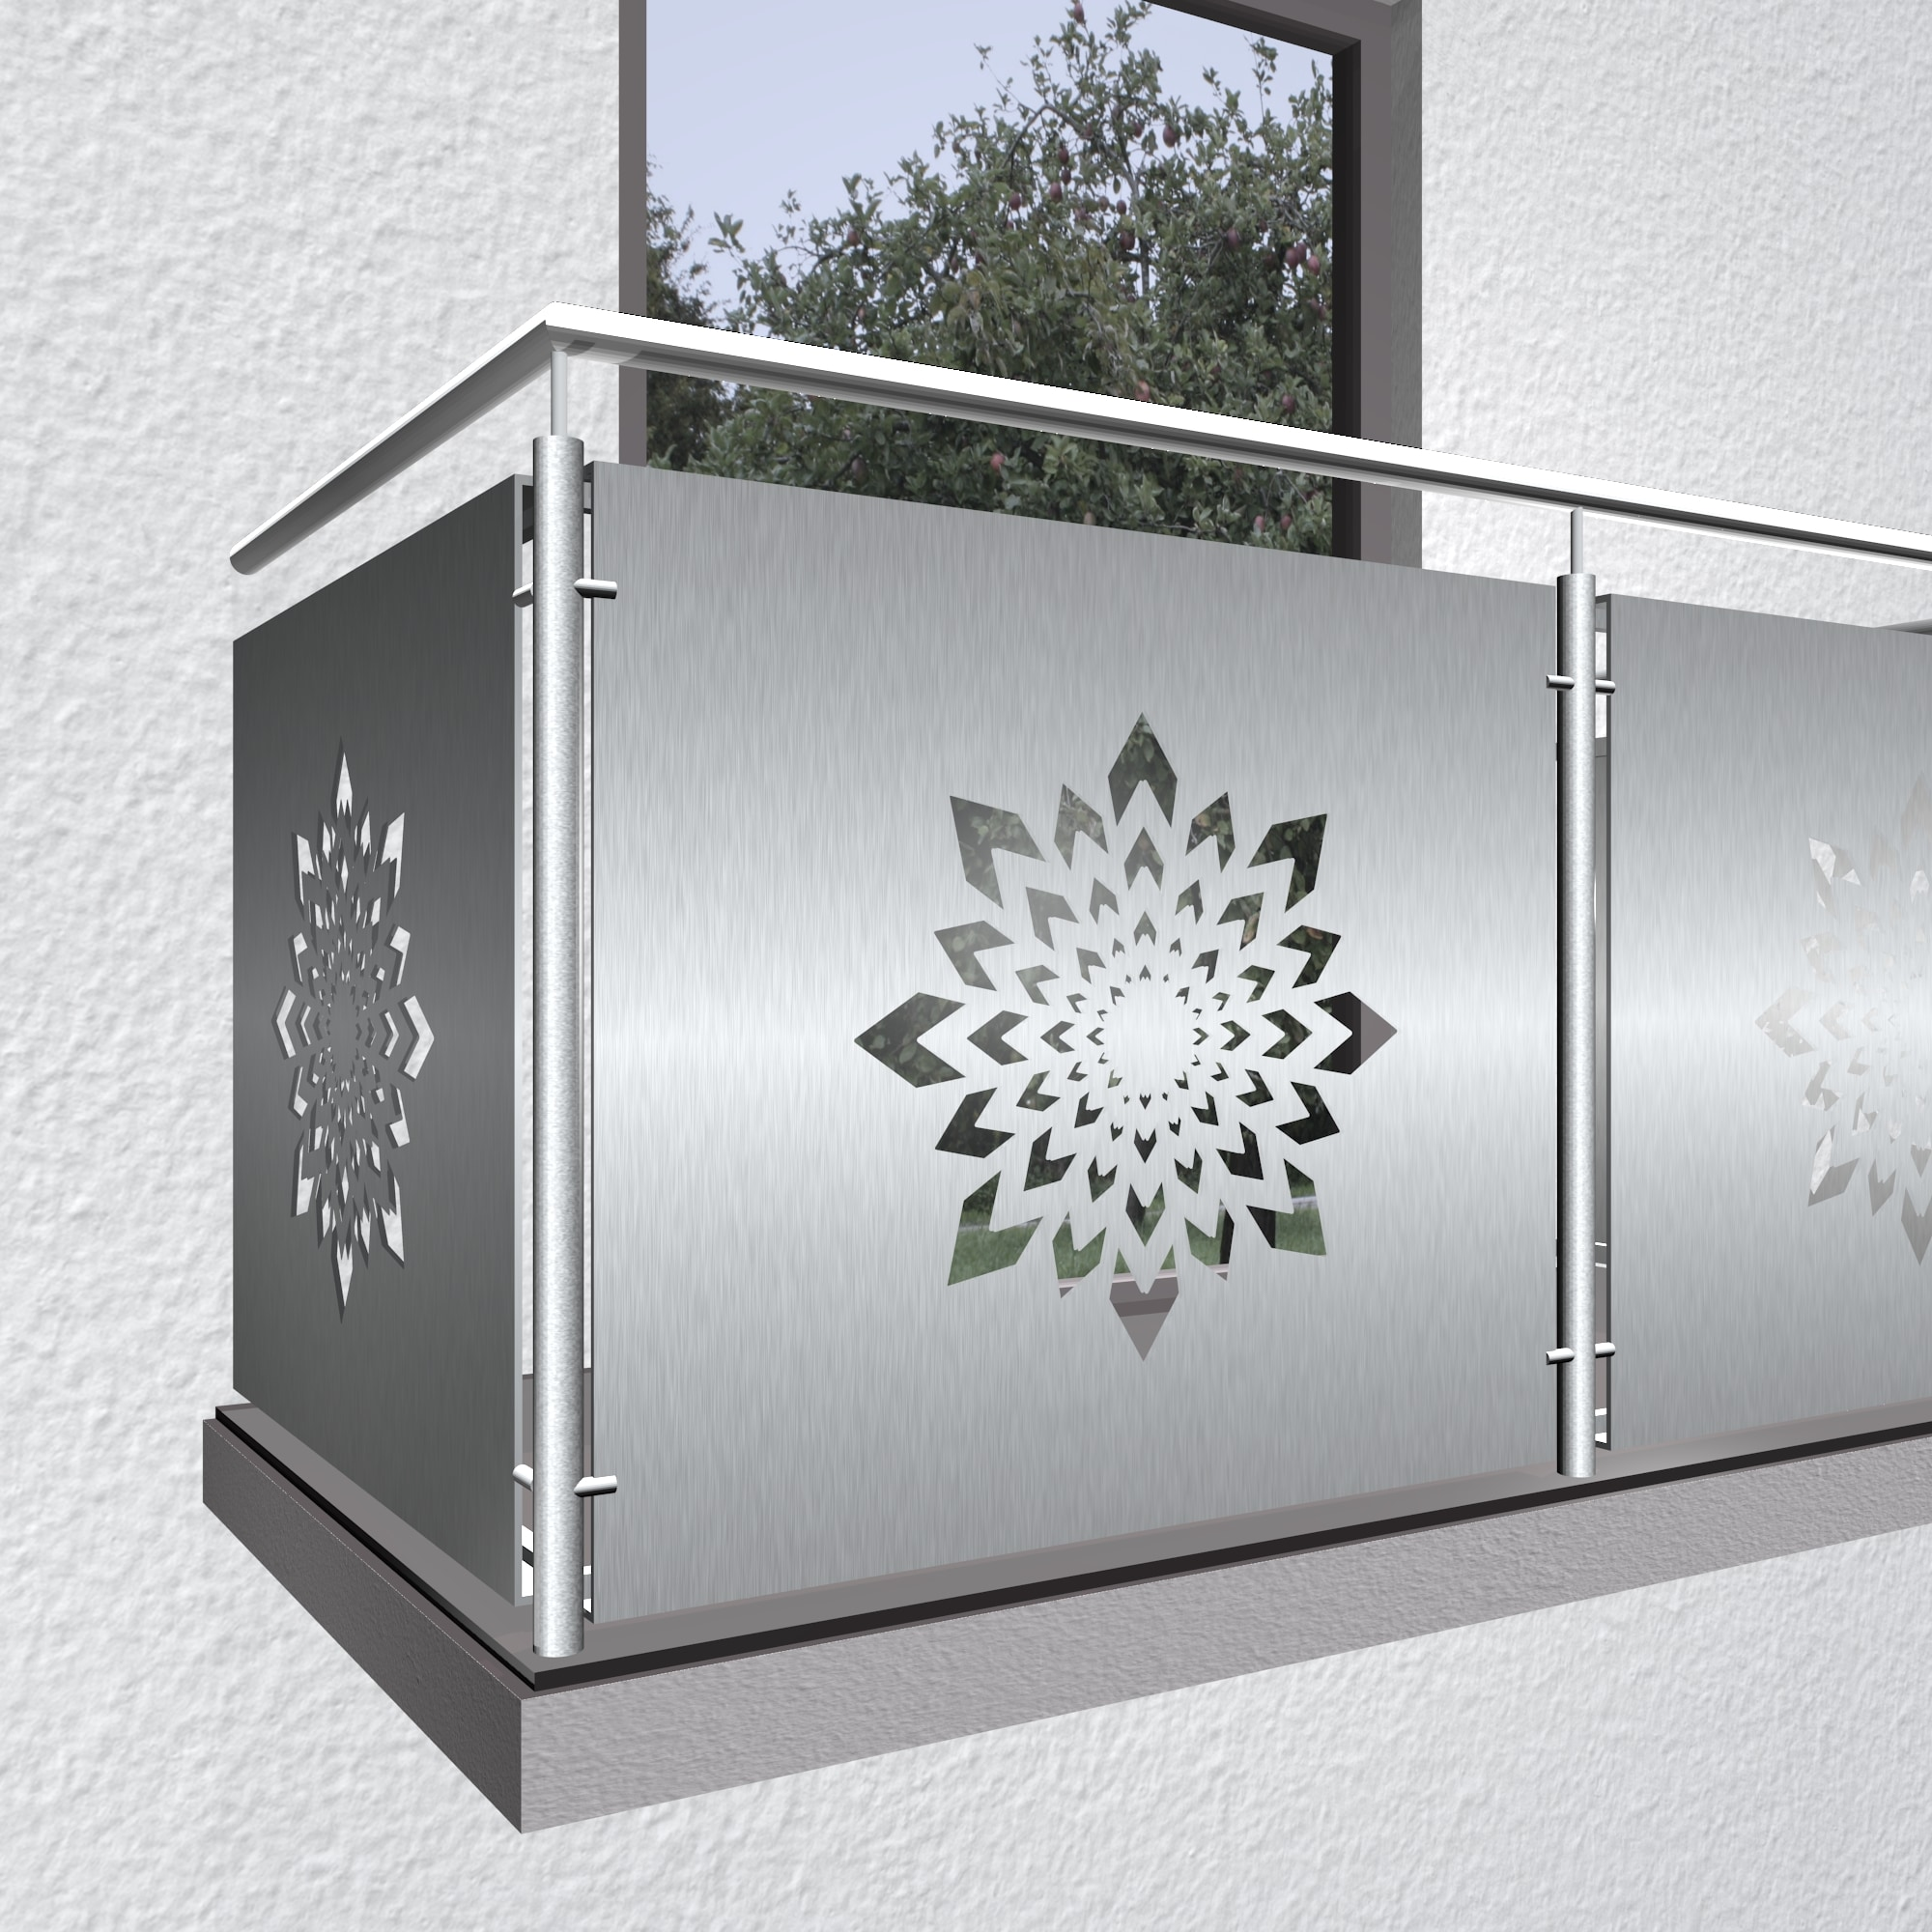 Balkonverkleidung Edelstahl KL